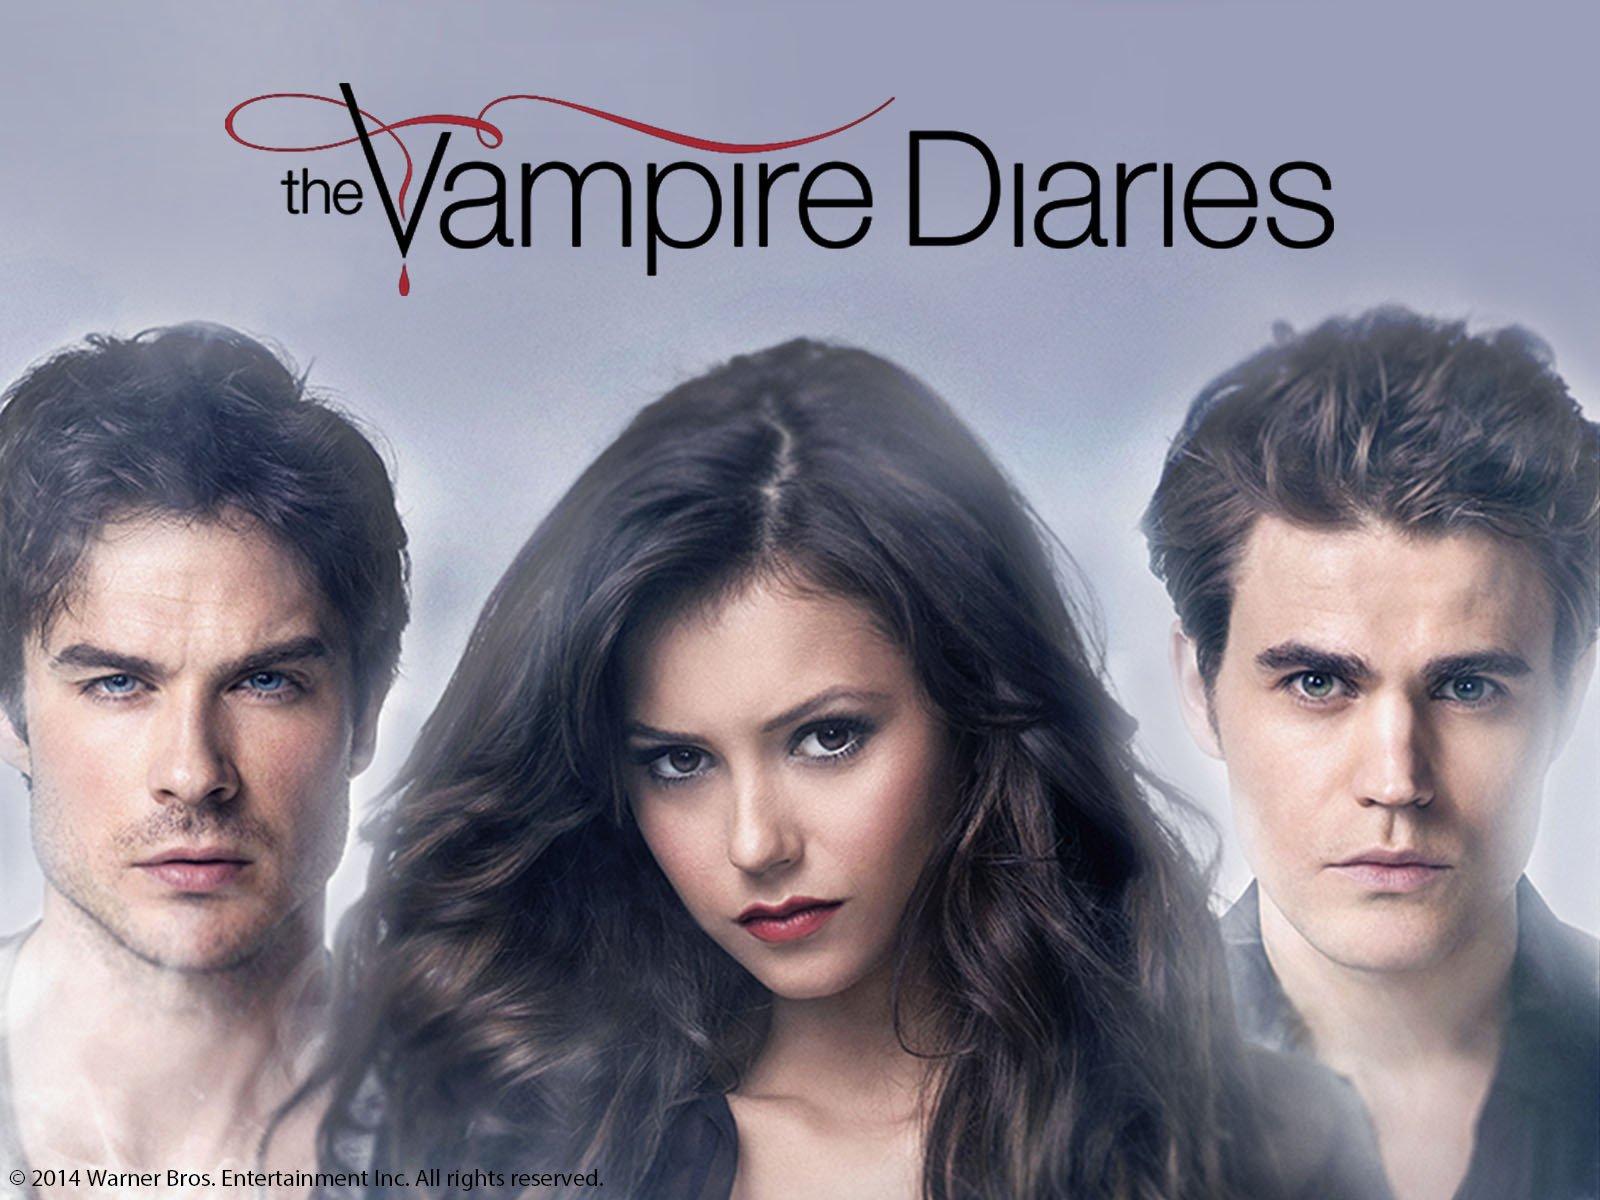 Amazon co uk: Watch The Vampire Diaries Season 6 | Prime Video